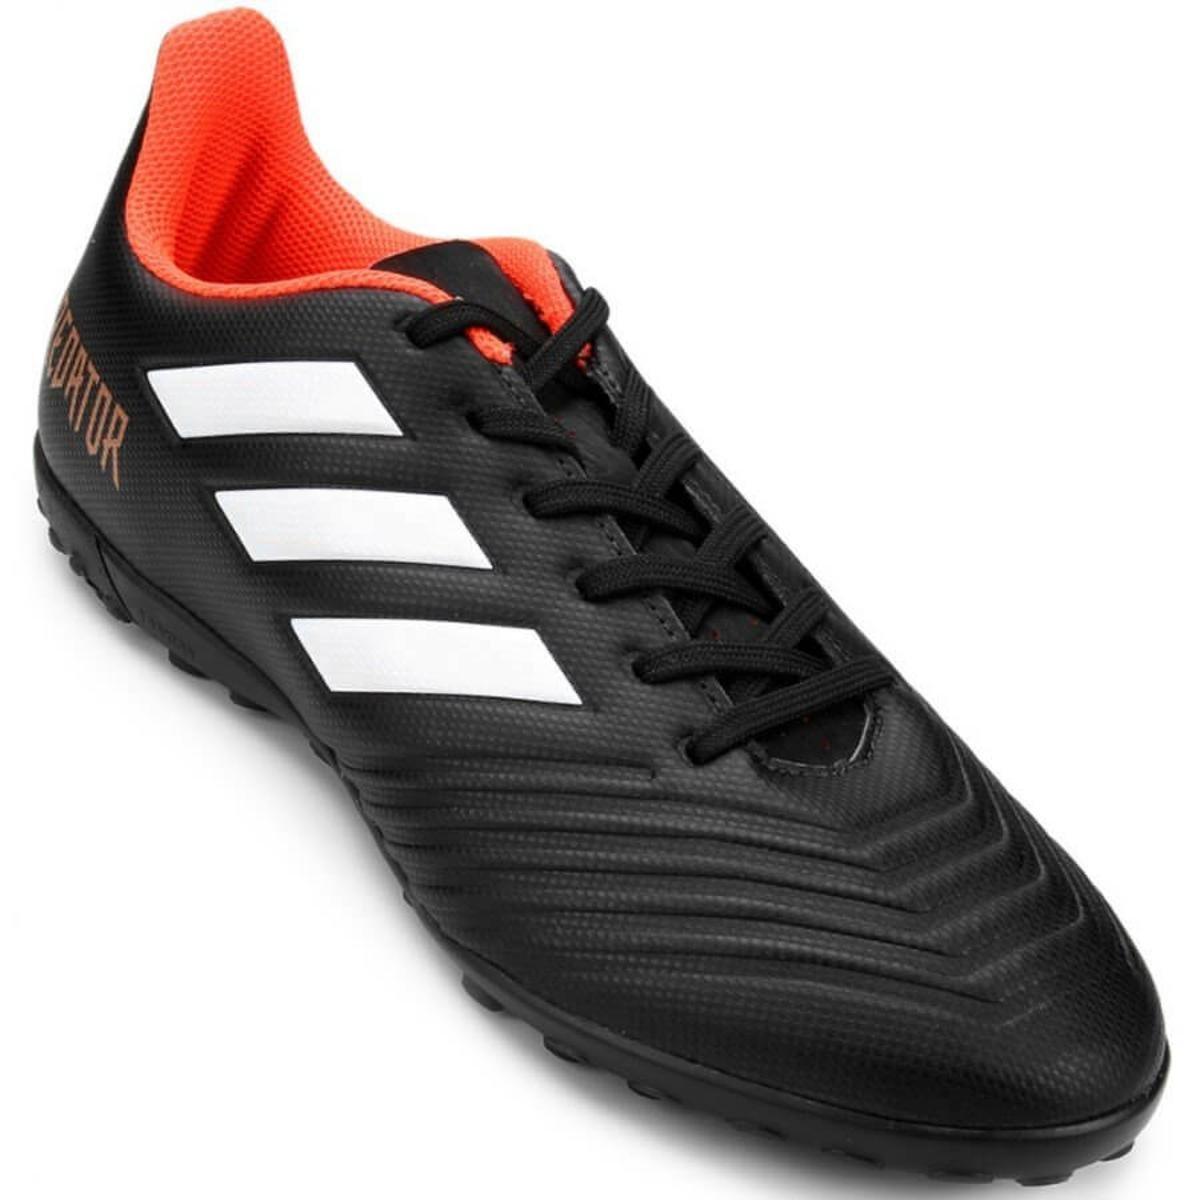 55ac77fe73 Chuteira Society Adidas Predator 18 4 TF